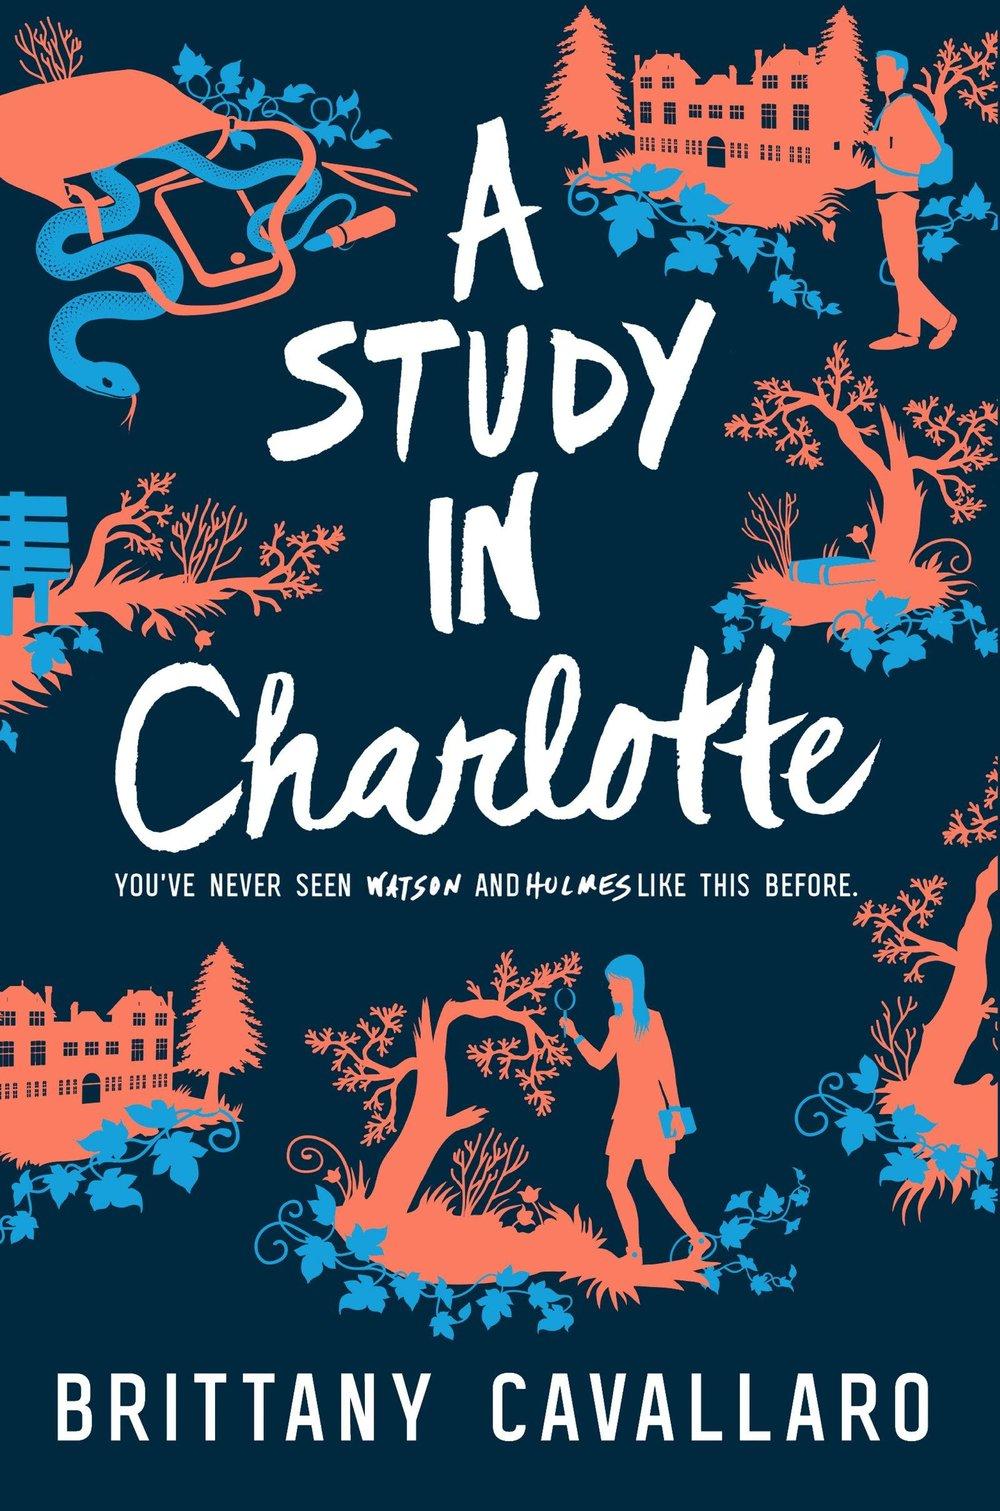 cavallaro-study-charlotte.jpg